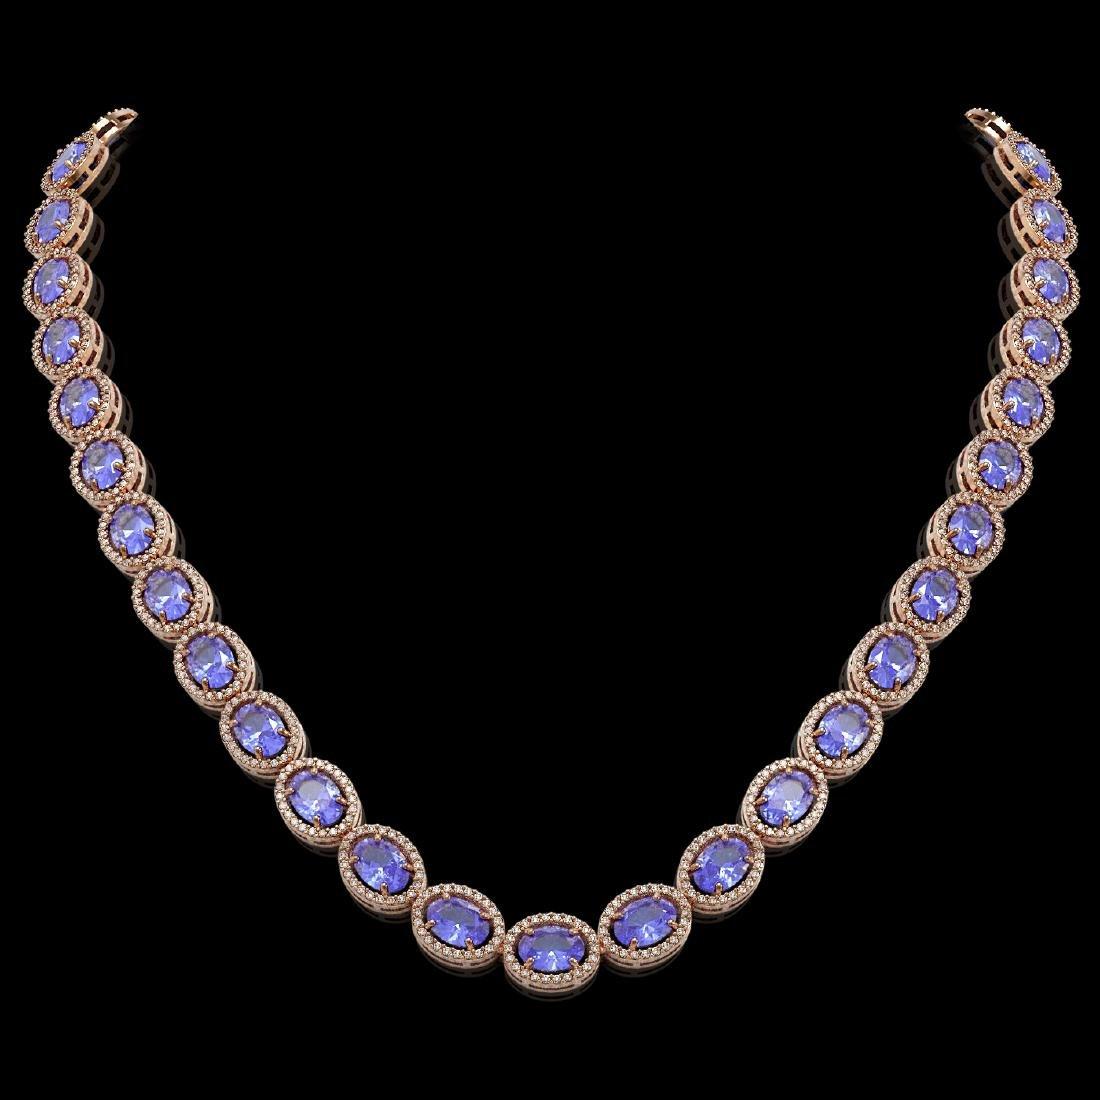 48.65 CTW Tanzanite & Diamond Halo Necklace 10K Rose